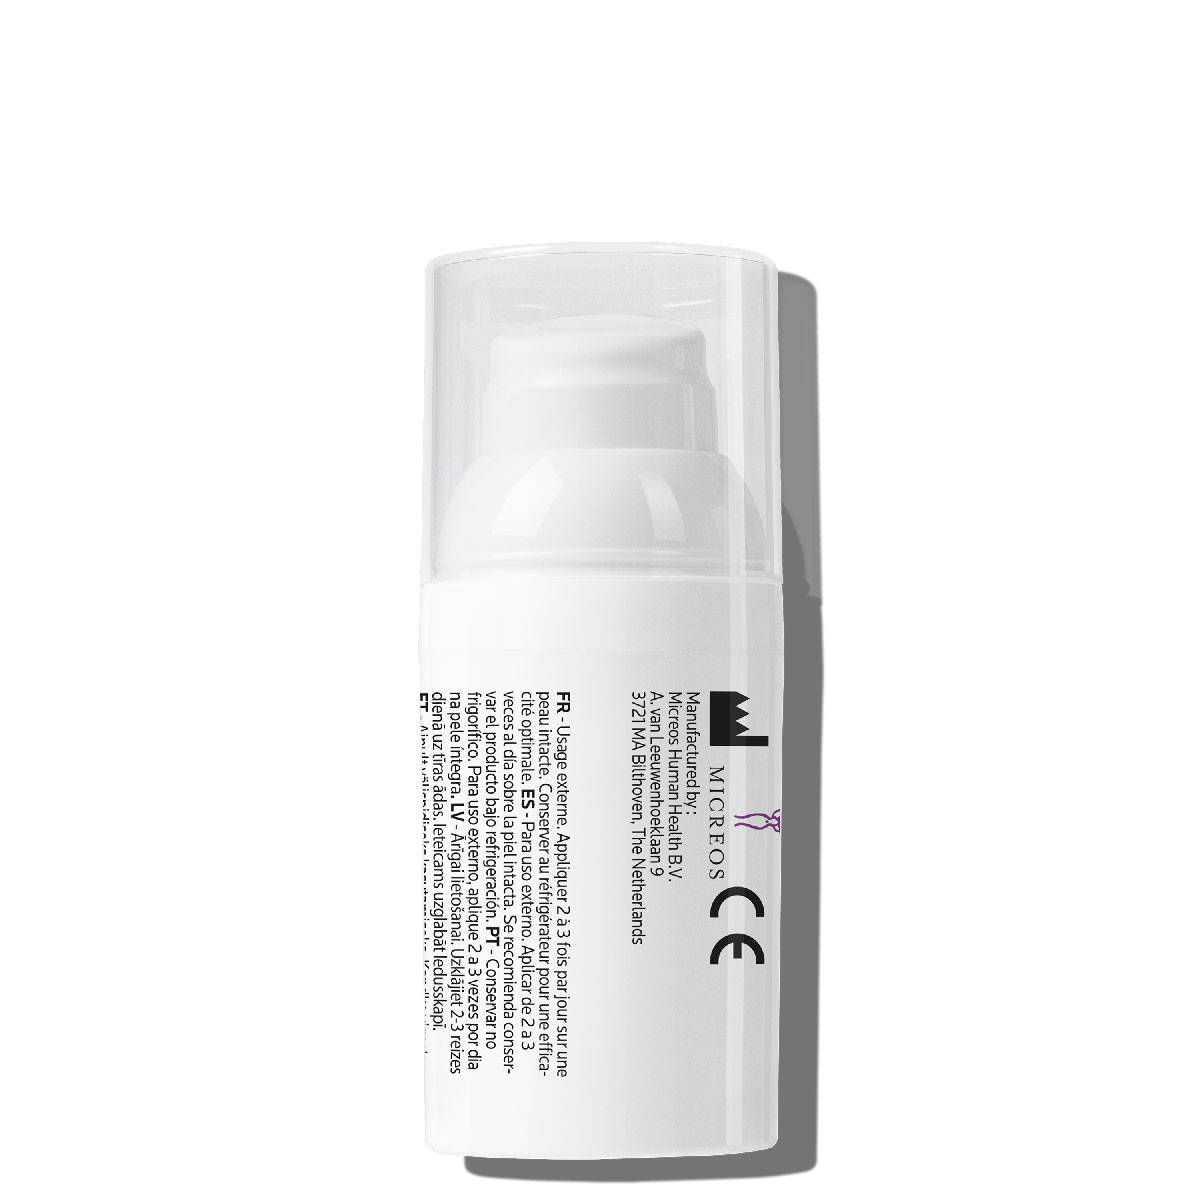 La-Roche-Posay-Lipikar-Eczema-Med-packshot-back